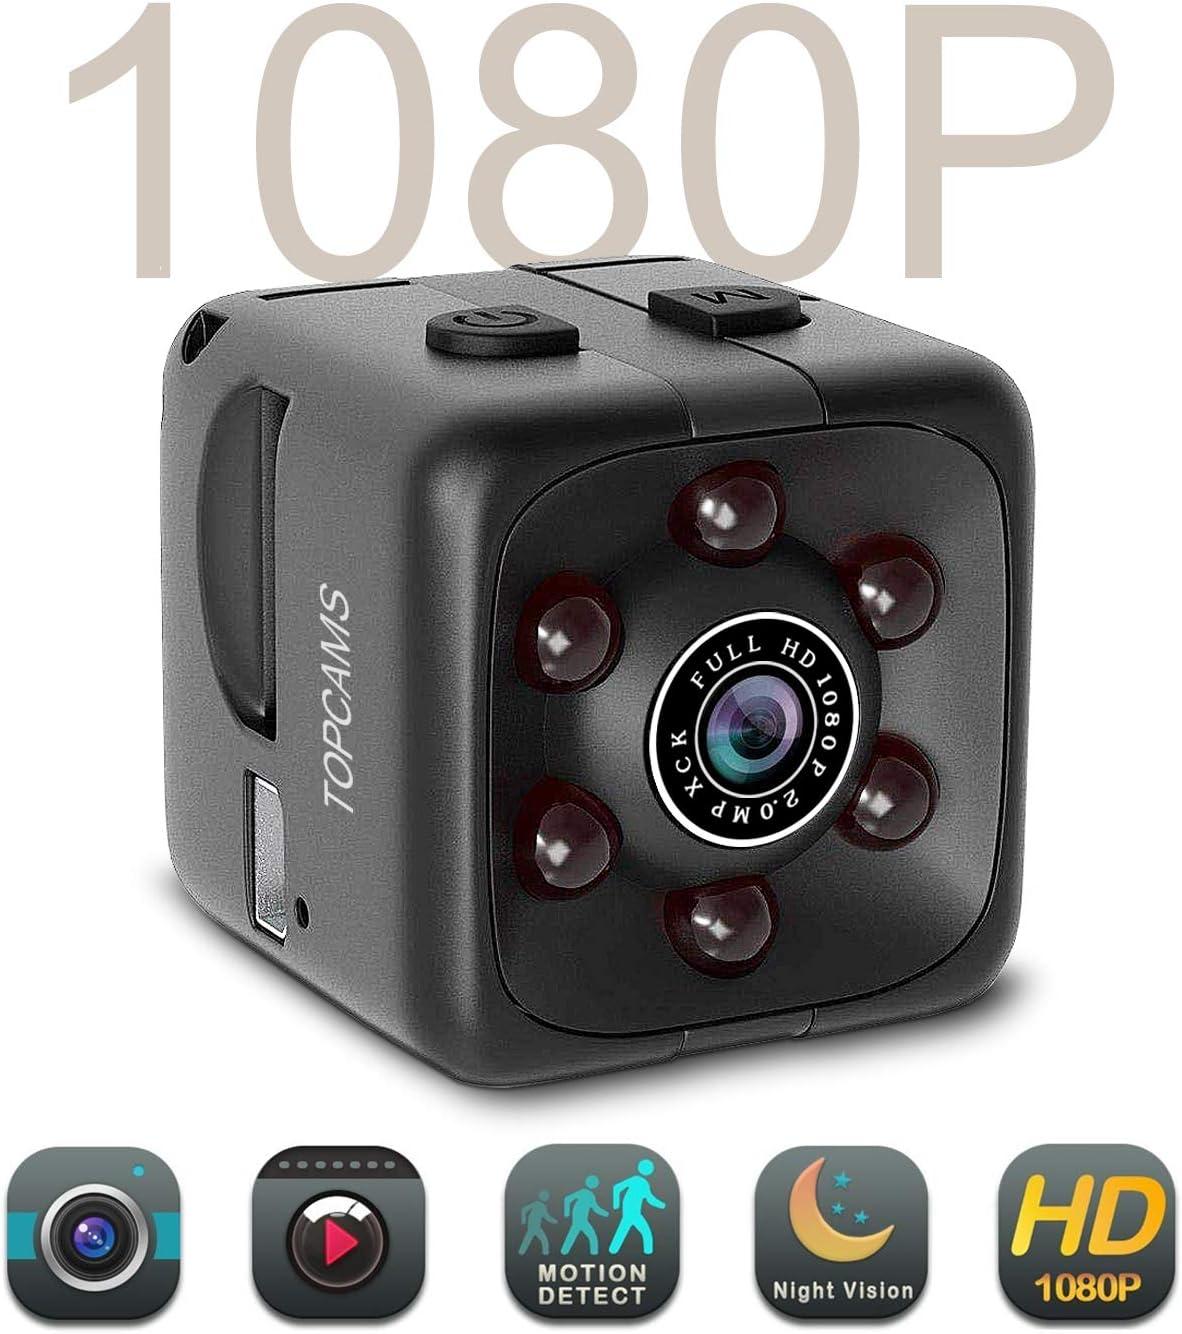 Mini HD 1080p Button SpyCamera Camera  Camcorder Video Recorder DV Pinhole DVR Z